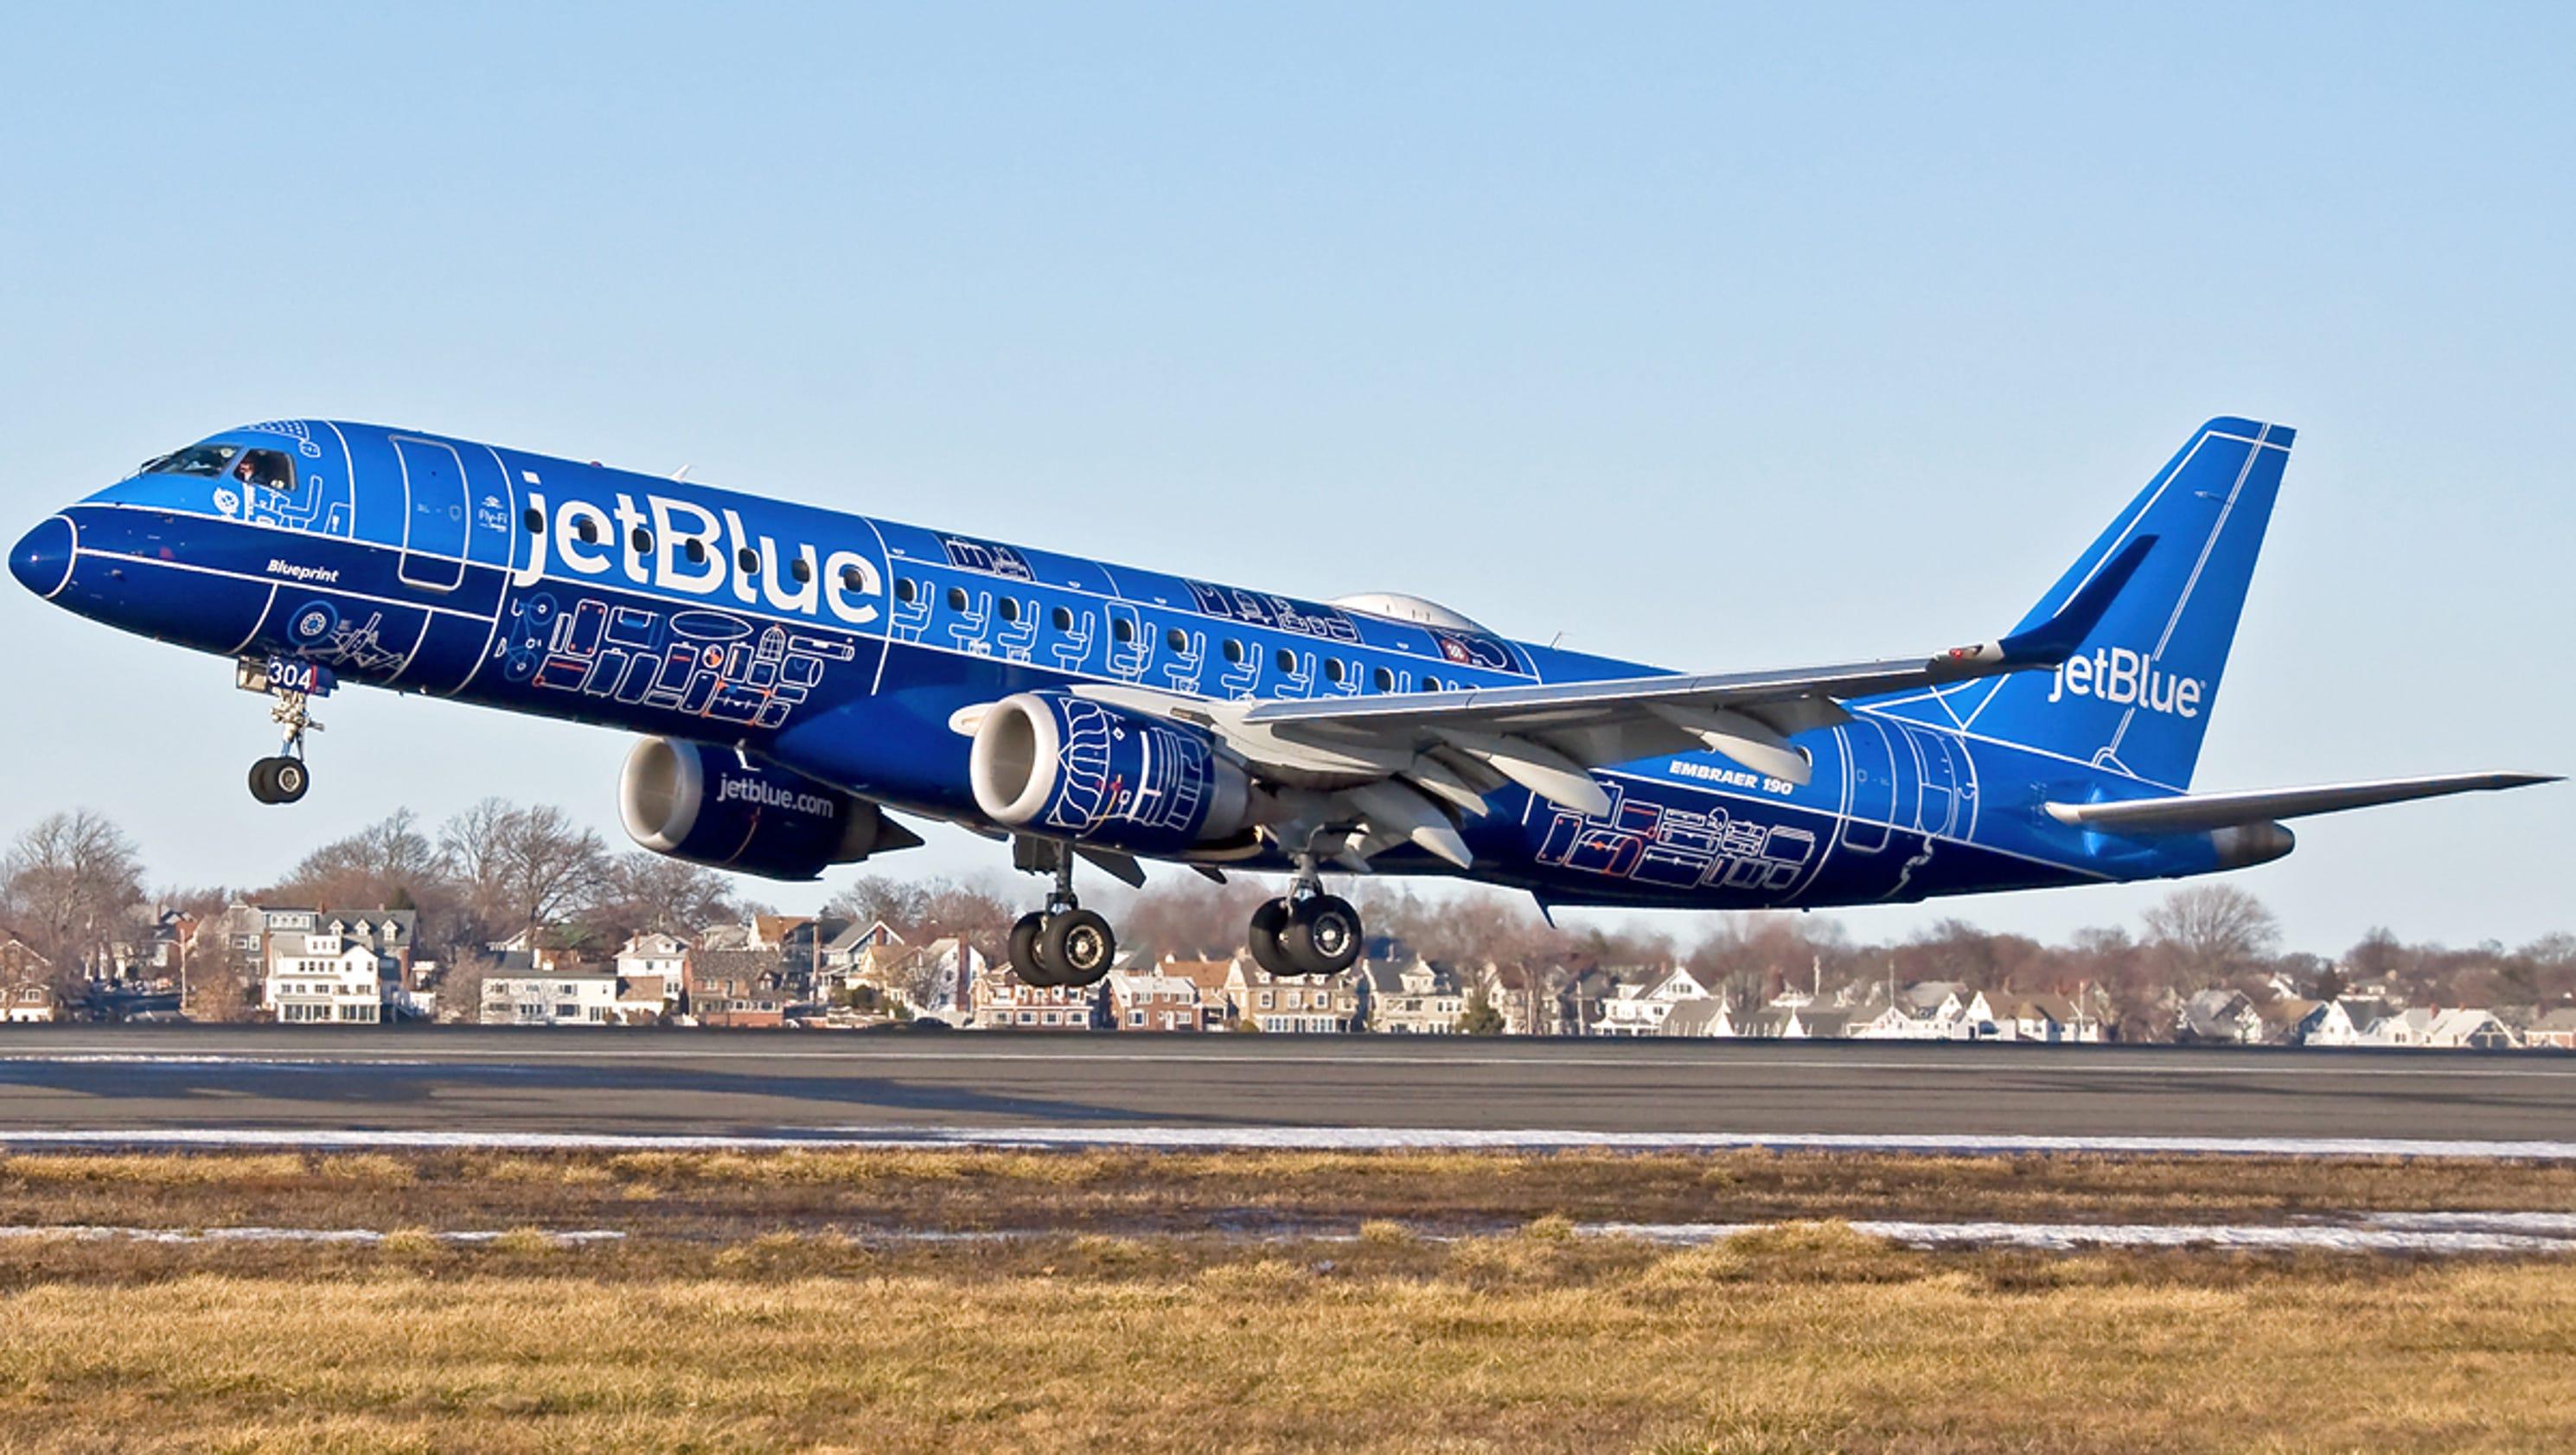 Jetblue New York Jfk Worcester Flights To Start In May